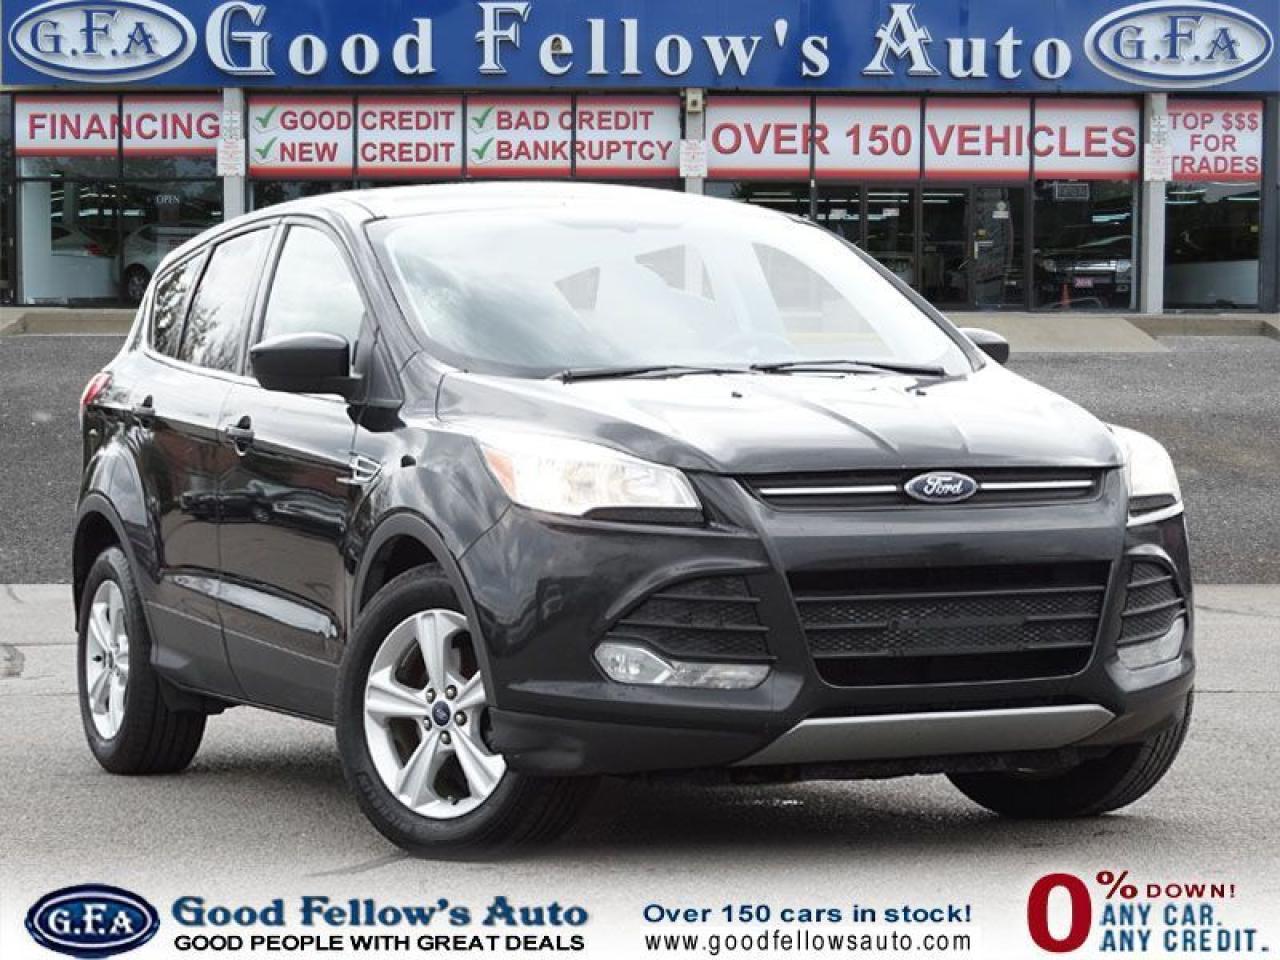 2014 Ford Escape SE MODEL, 1.6 L ECO, REARVIEW CAMERA, HEATED SEATS